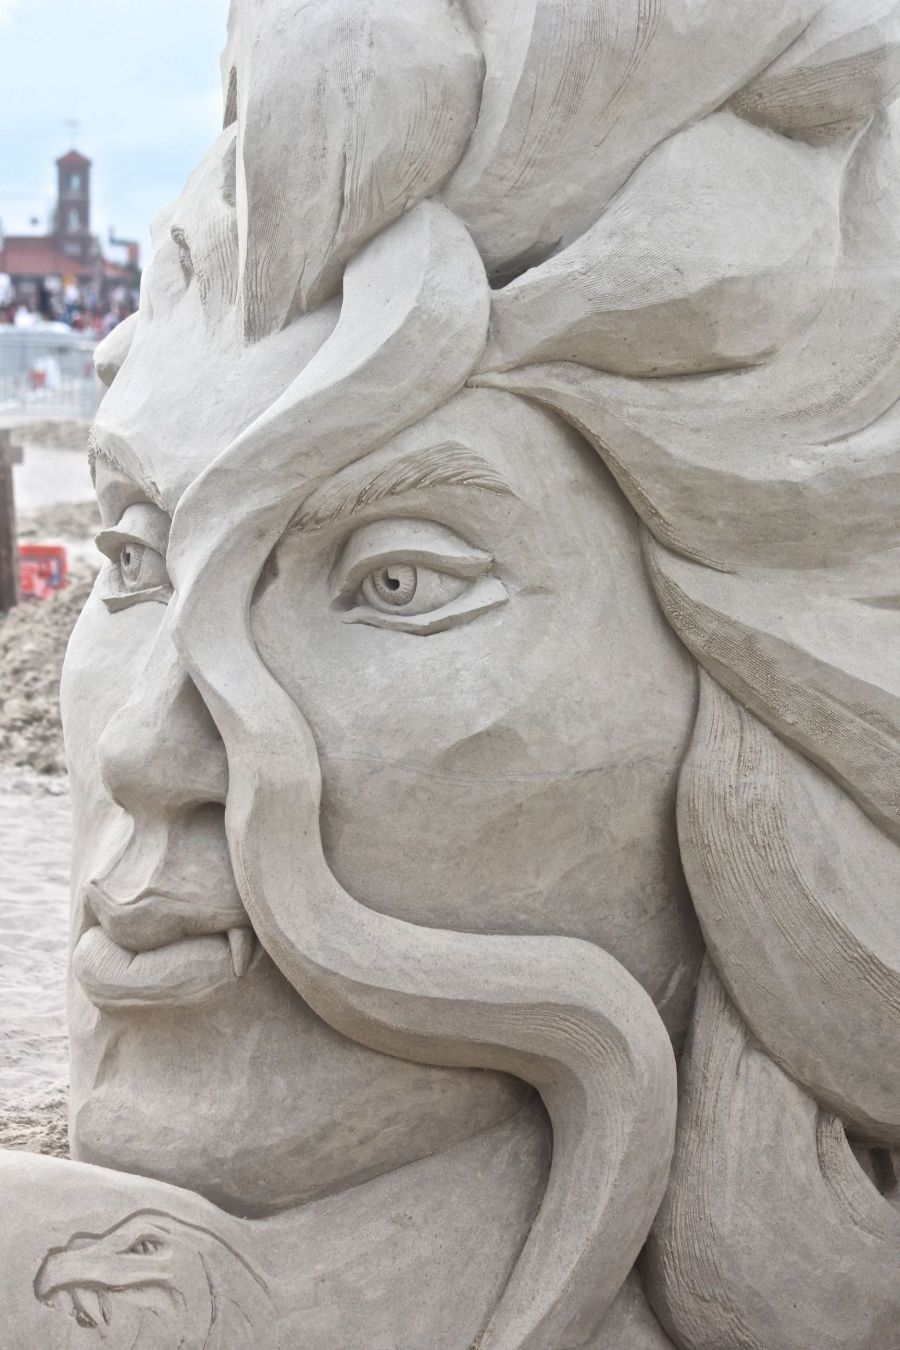 boston revere beach sand sculpture festival face sculpture closeup